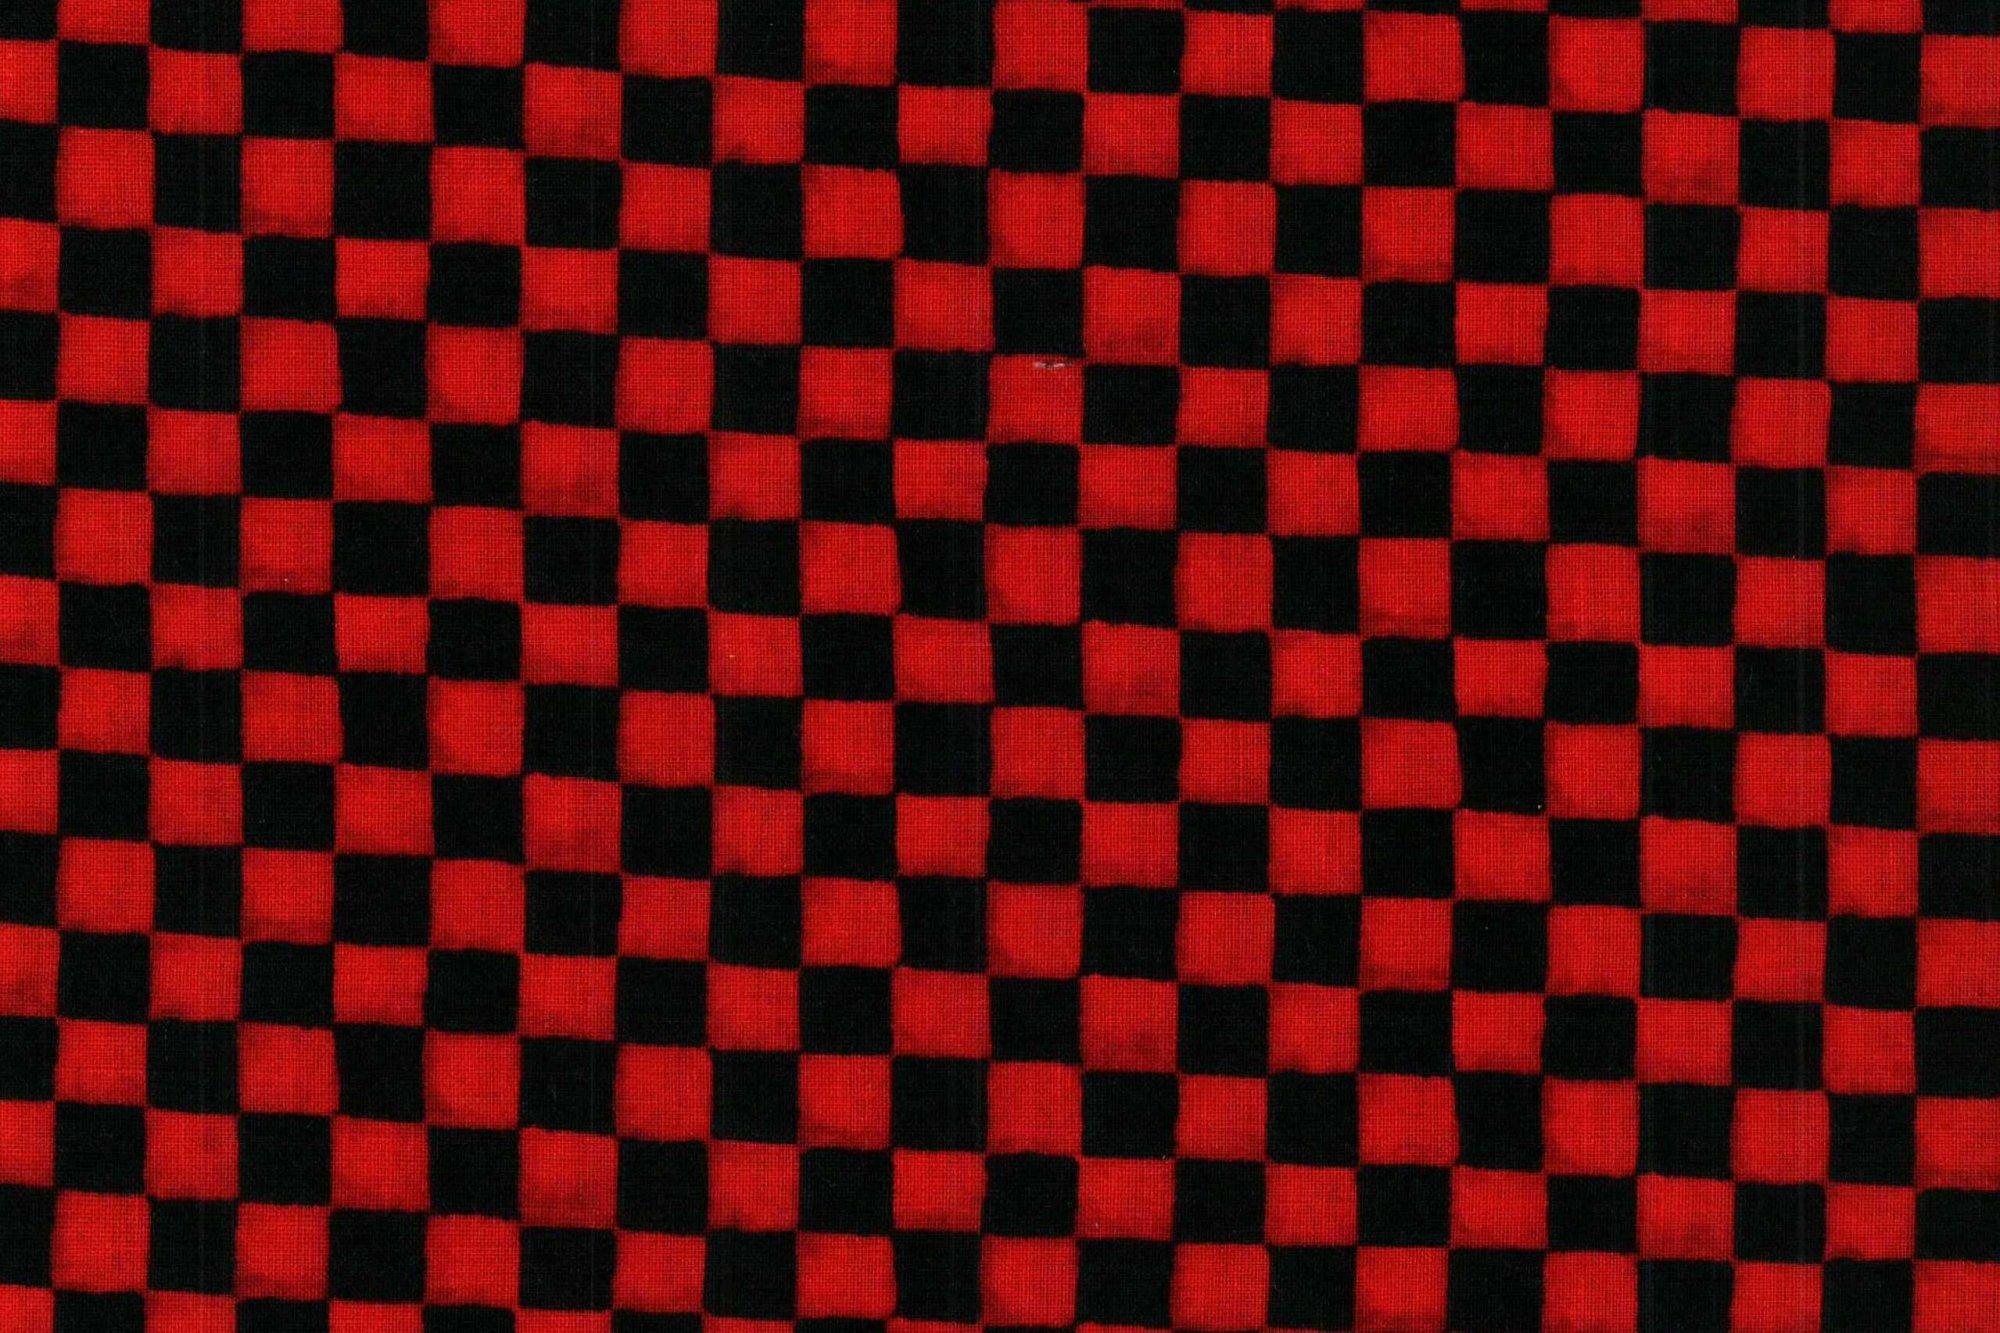 WILMINGTON 84335 RED-BLACK CHECKS